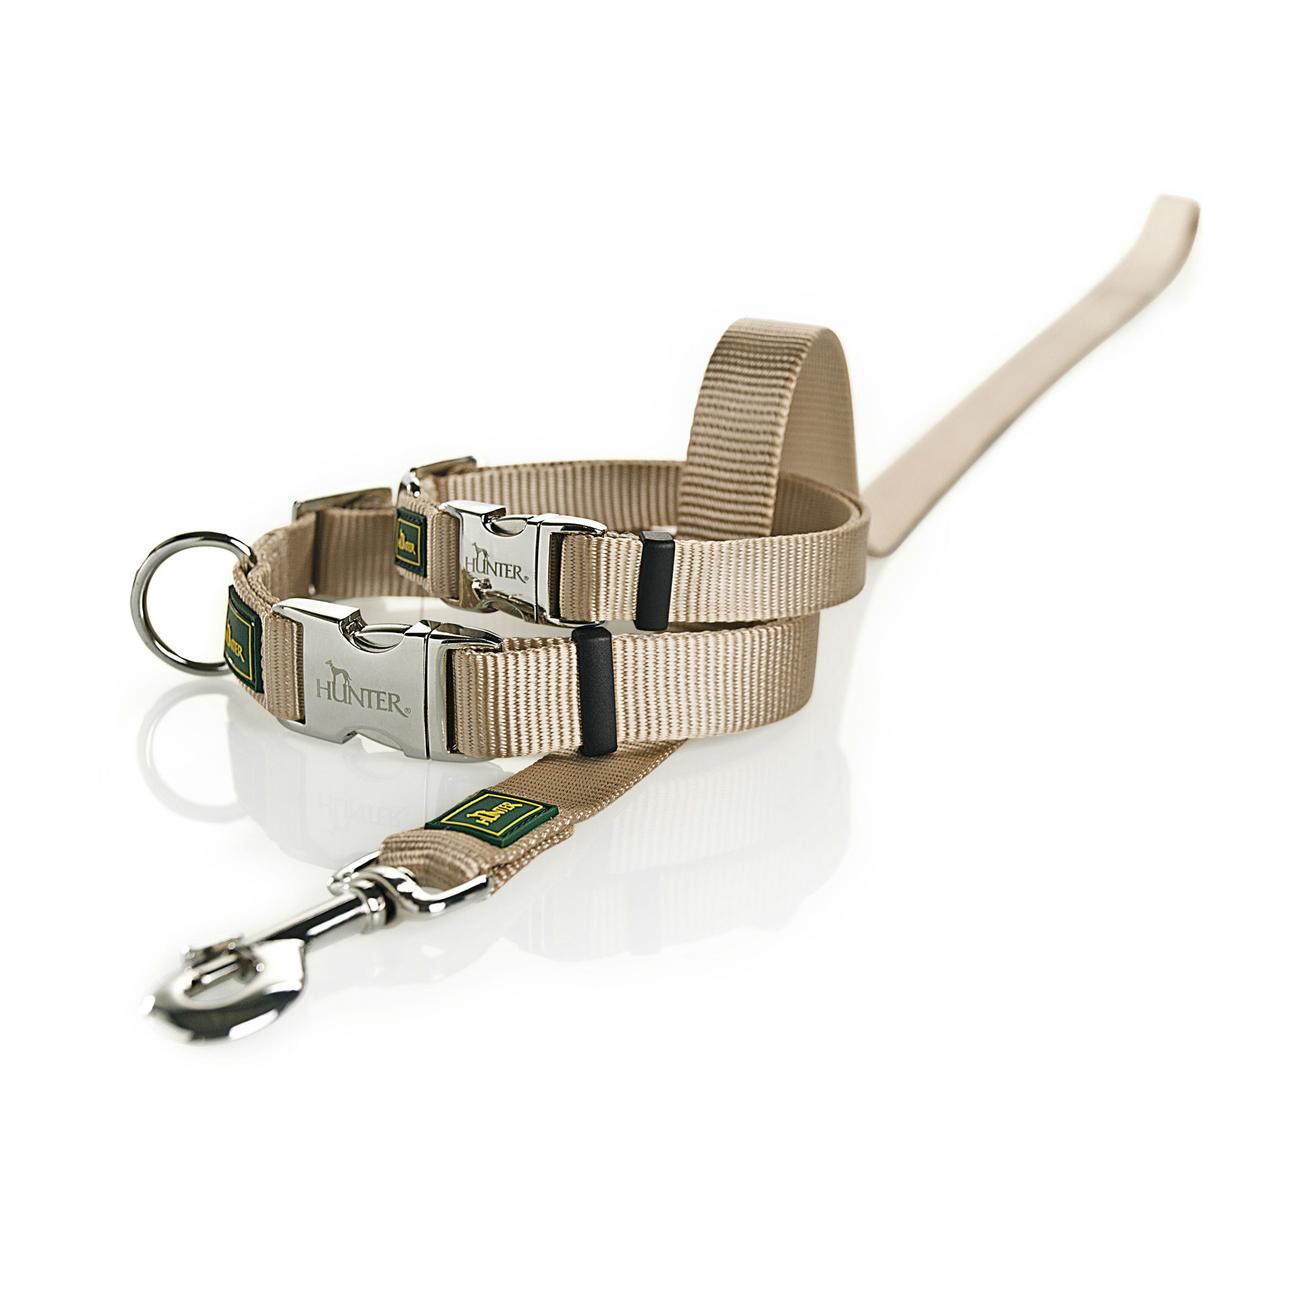 Hunter Halsband Vario Basic Alu Strong Verschluss 46668, Bild 17